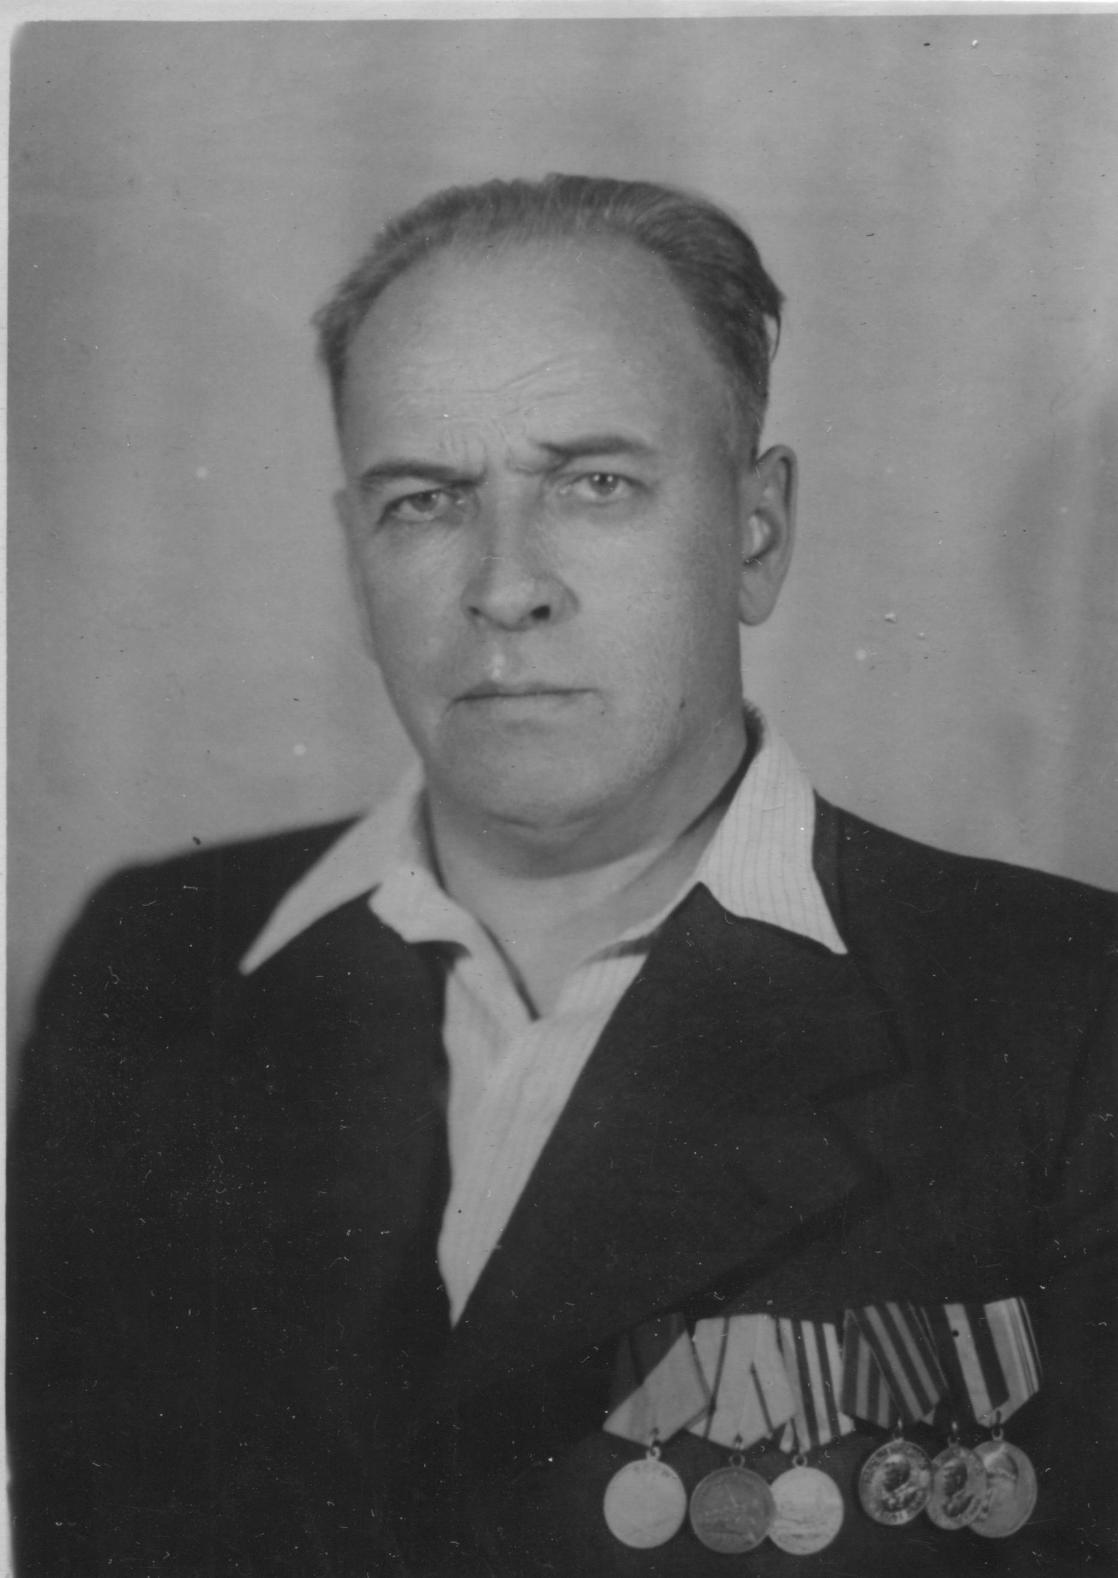 Н. А. Фигуровский, конец 1940-х гг.